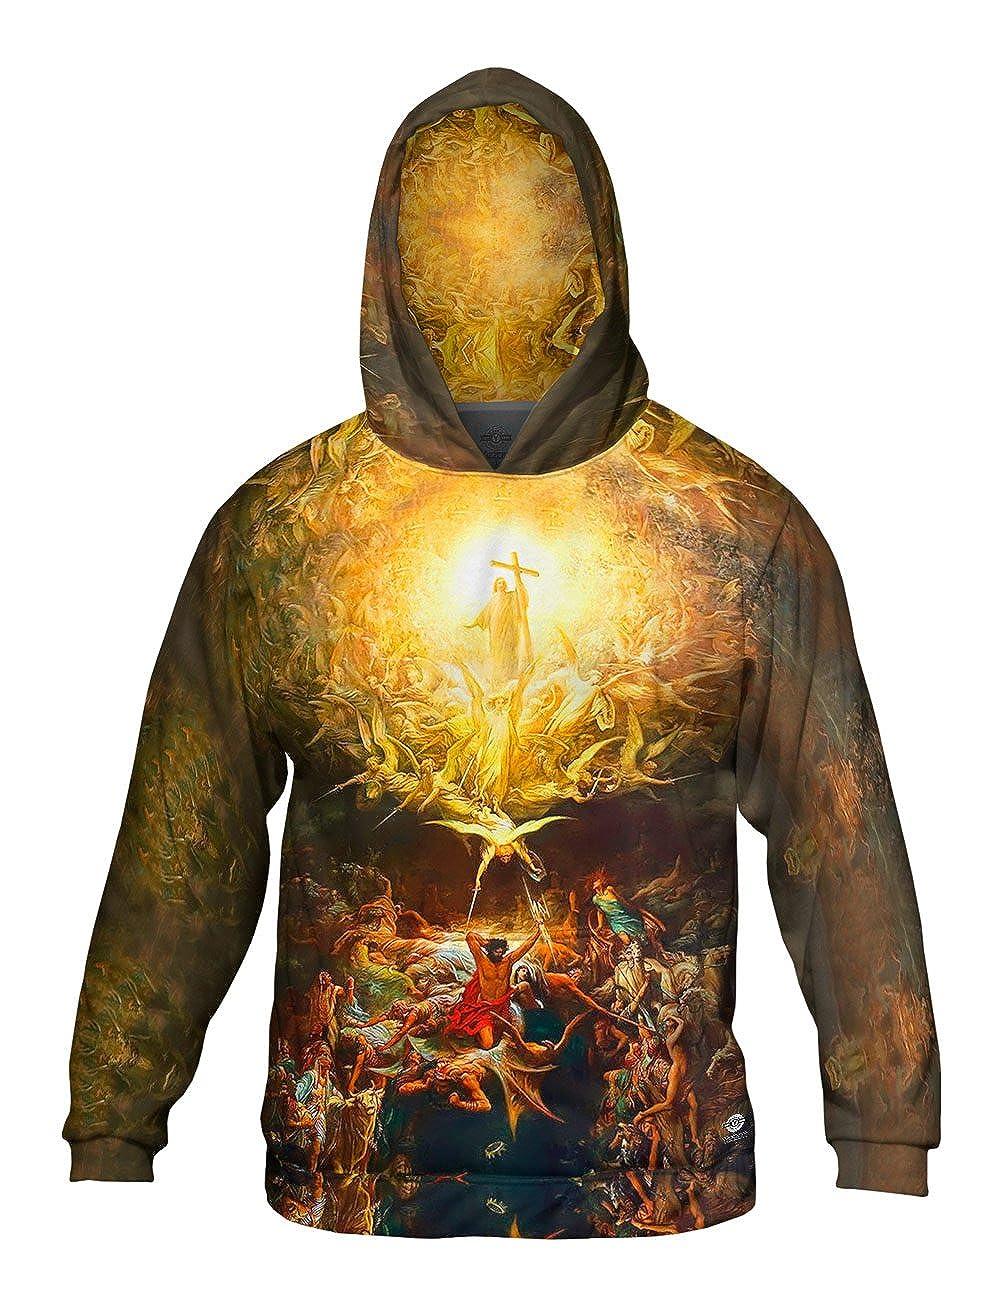 Mens Hoodie 2265 Allover Print Yizzam- Gustave Dore Triumph of Christi